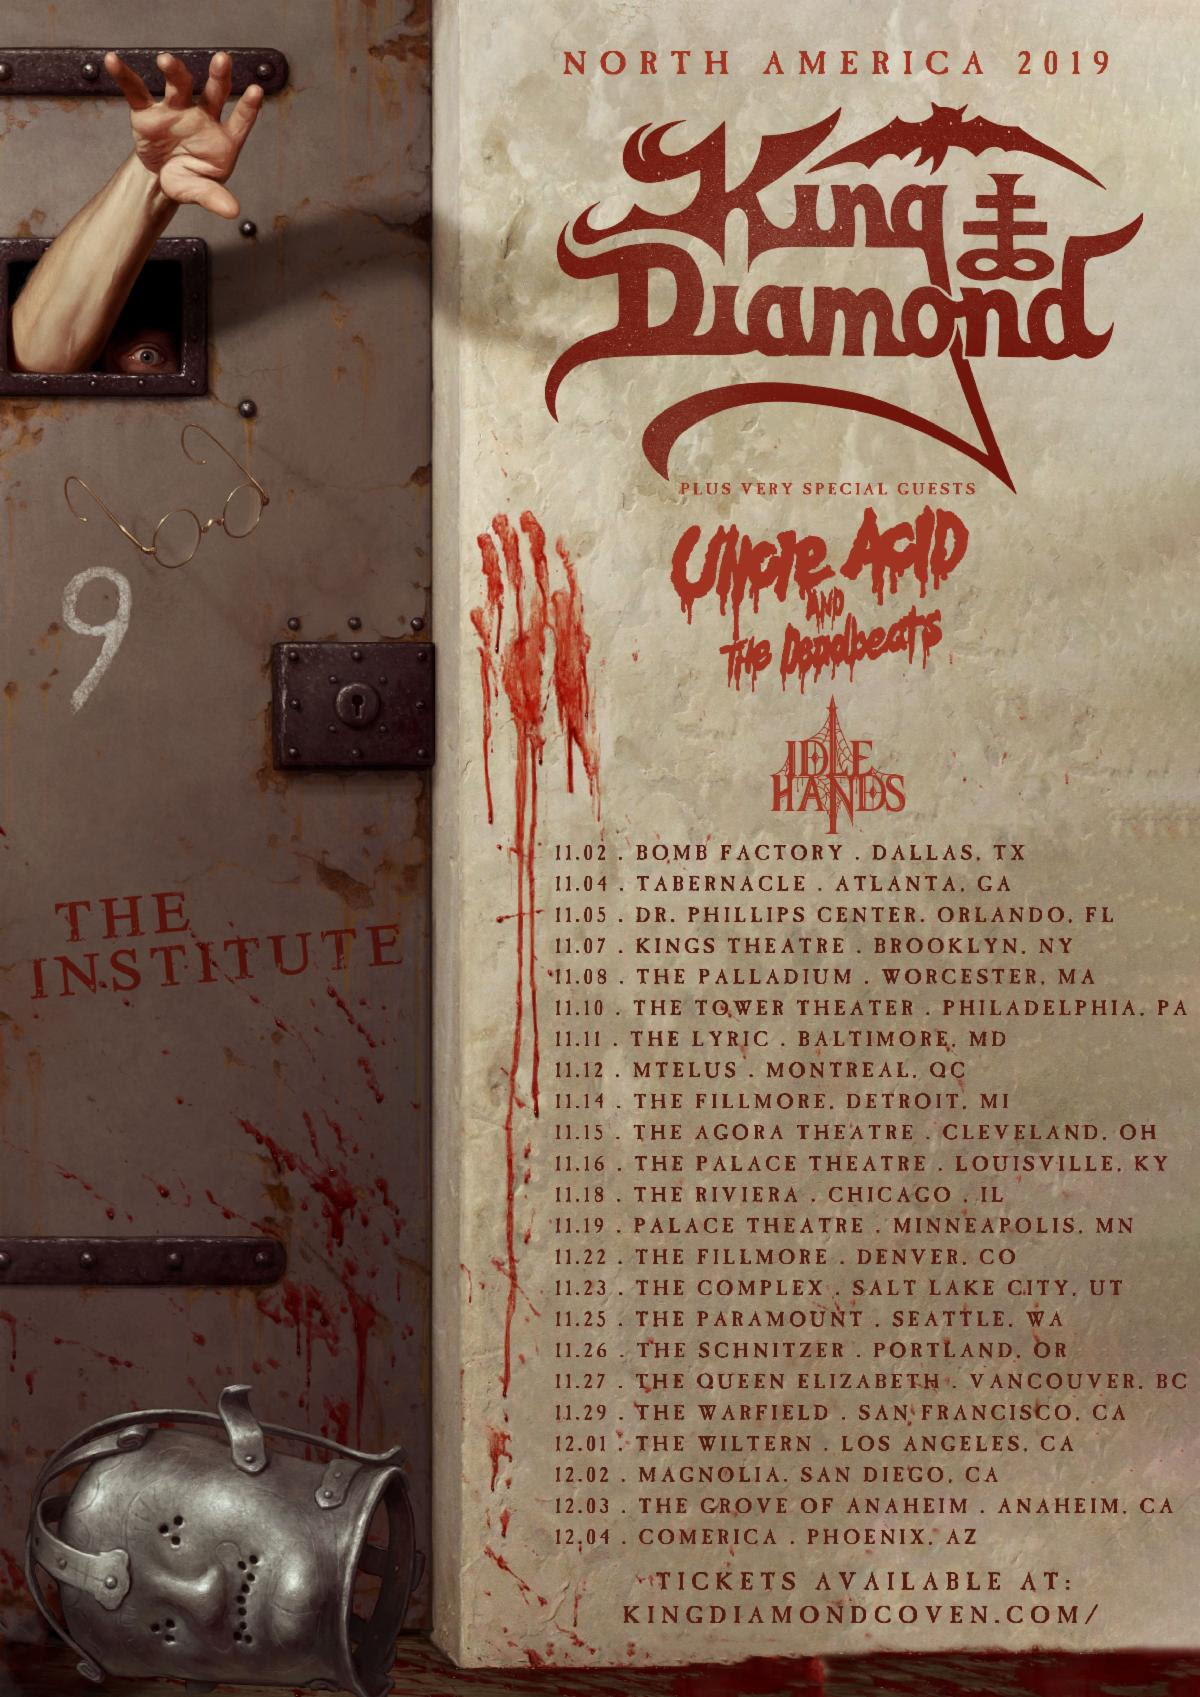 Diamond Tours 2020 Schedule King Diamond Announces New Album The Institute for 2020 Release